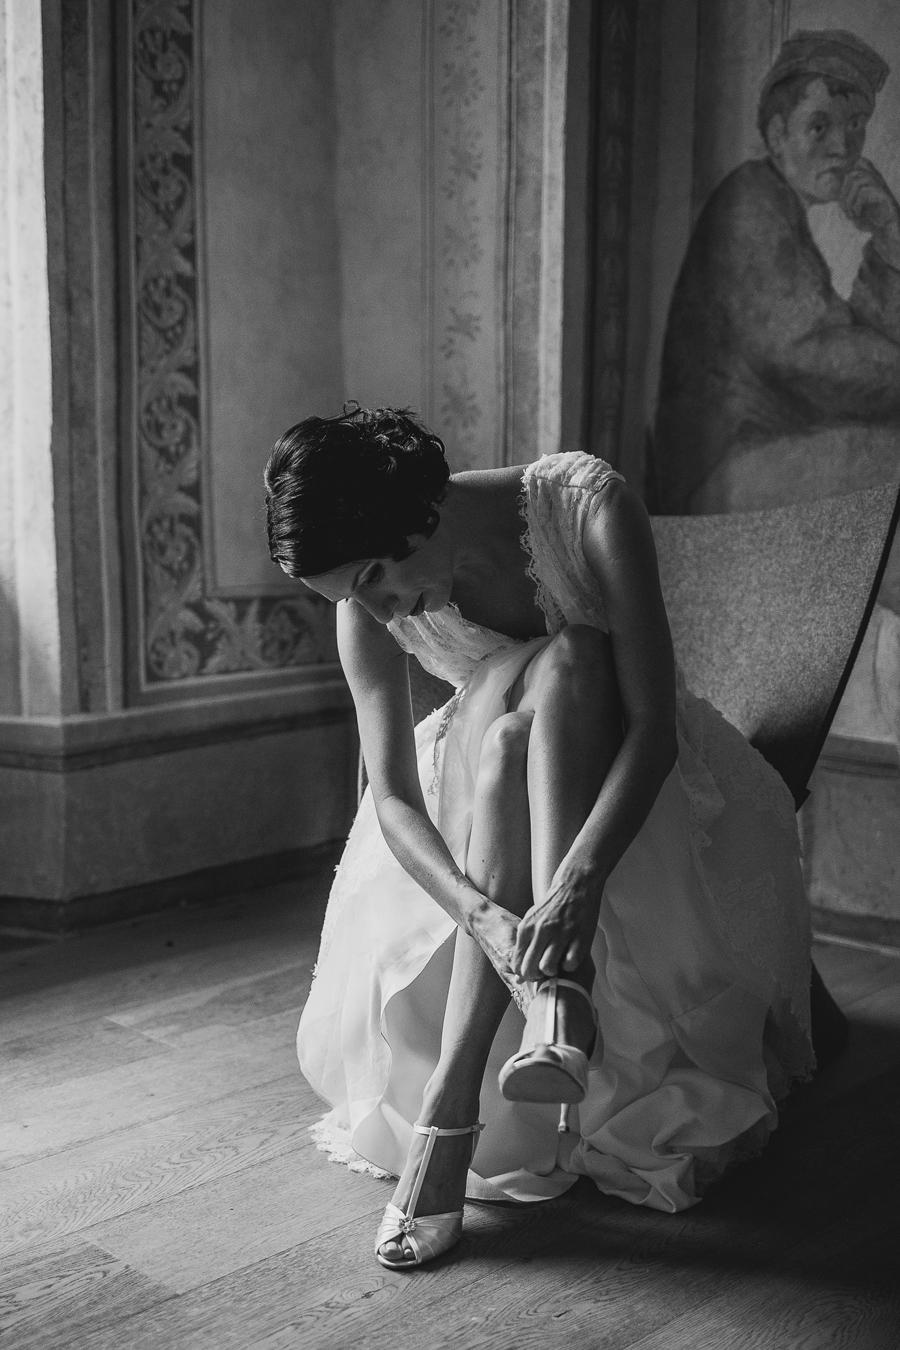 kranj_layer_poroka_wedding_photography_hochzeit00652.jpg